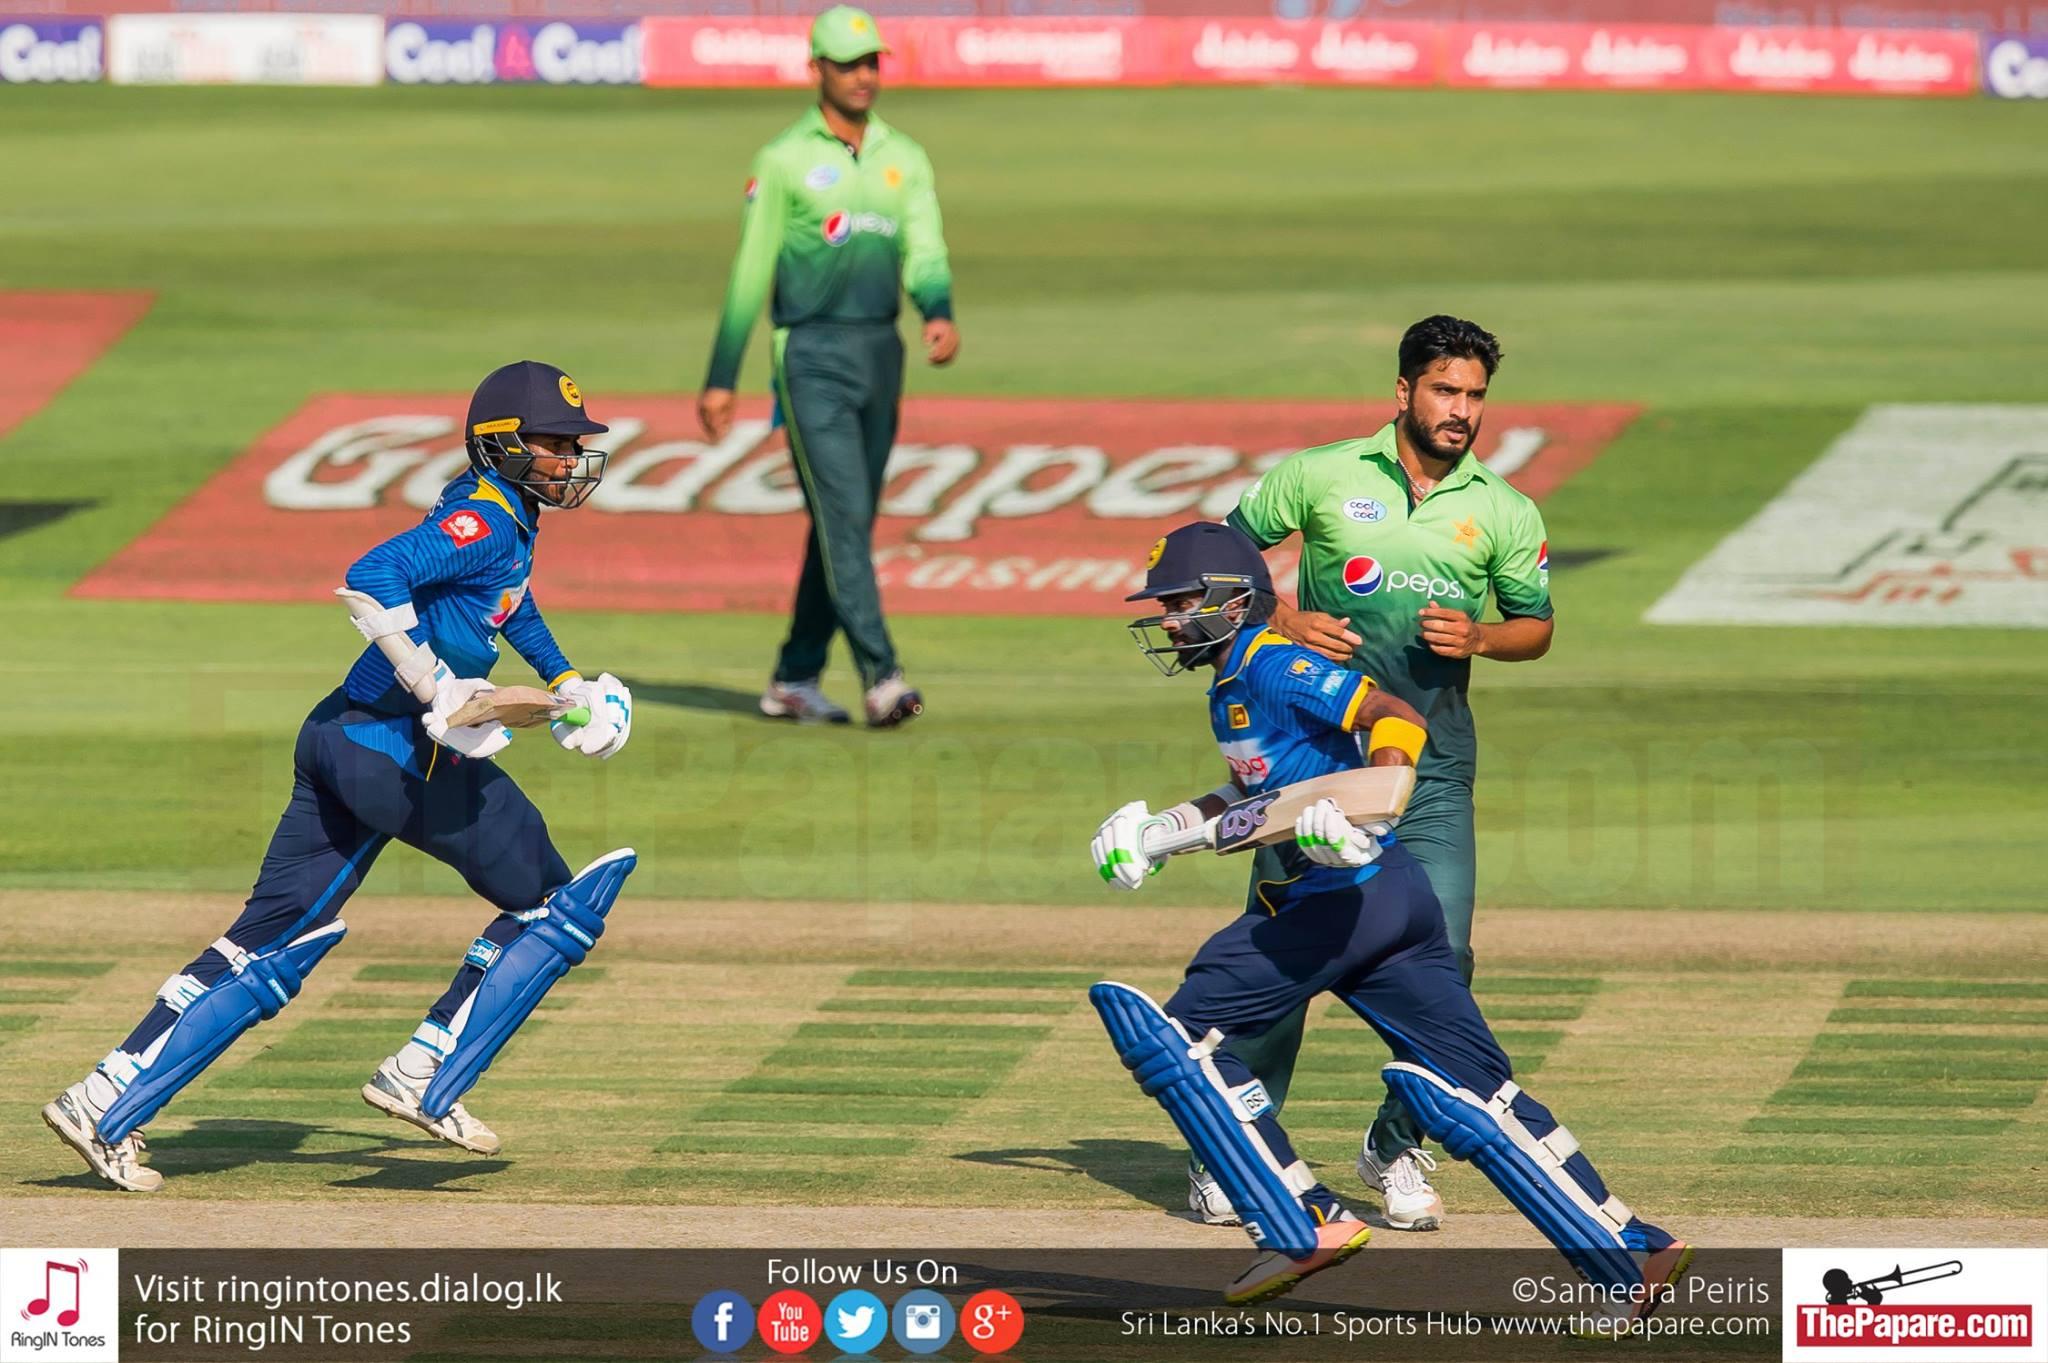 Photos: Sri Lanka Vs Pakistan 2017 – 3rd ODI